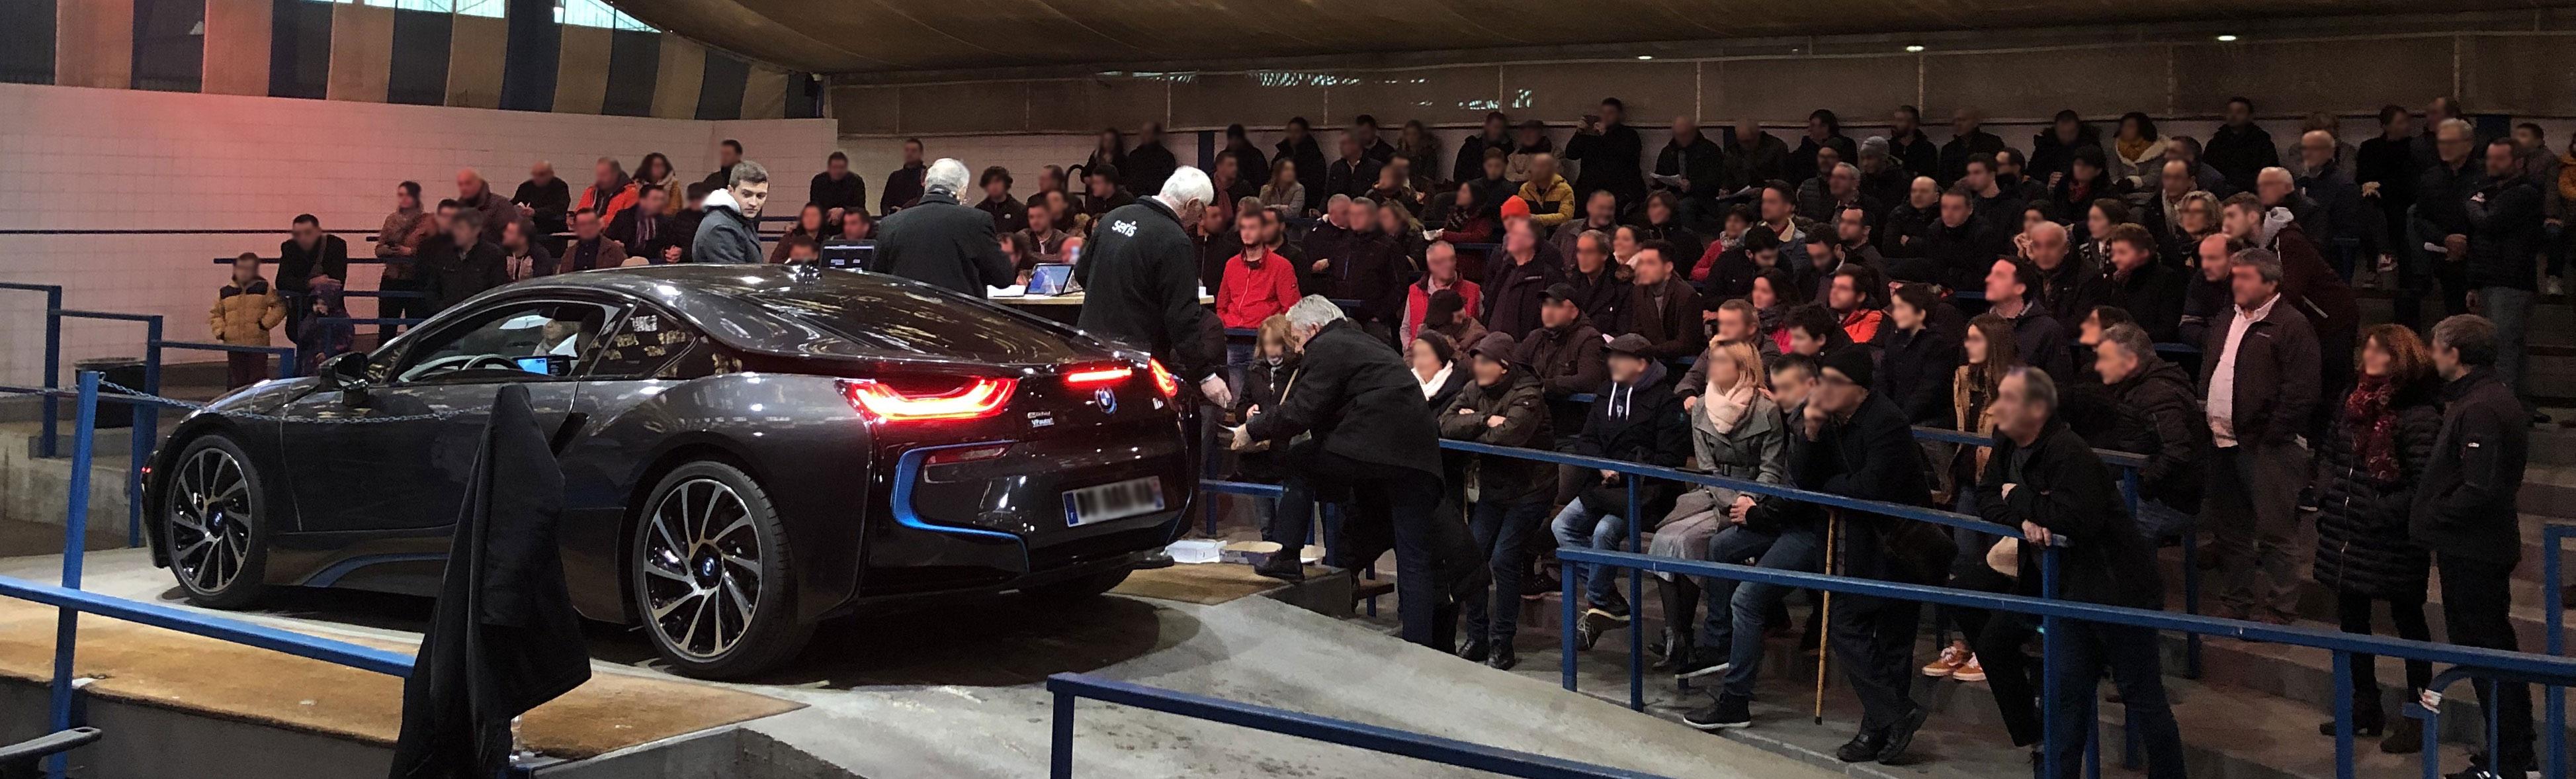 BMW I8 encheres ouverte public